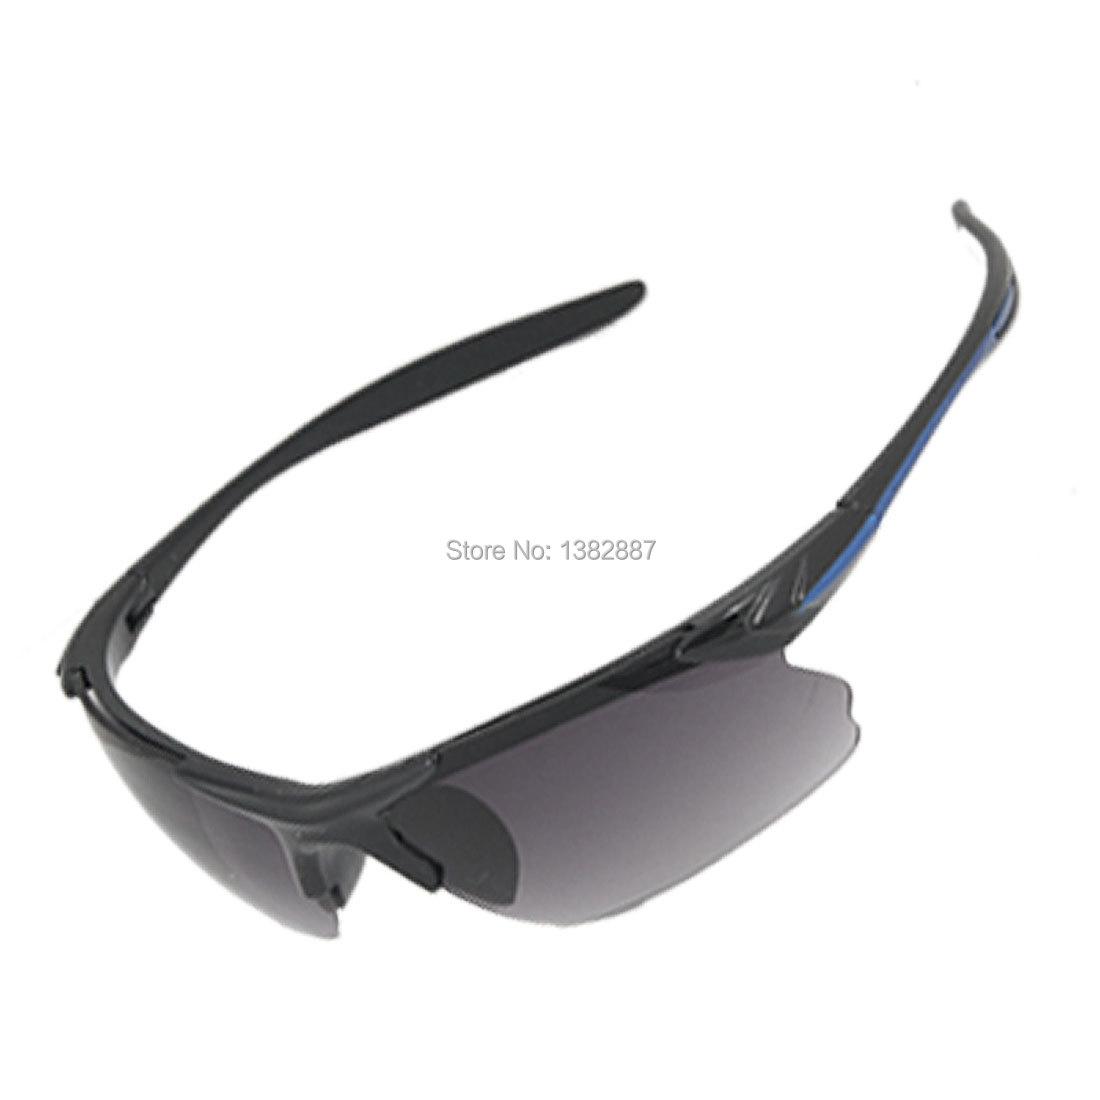 Unisex Smoke Lens Blue Black Arms Sports Sunglasses Eyewear Protector Glasses New Lens Discount 50(China (Mainland))